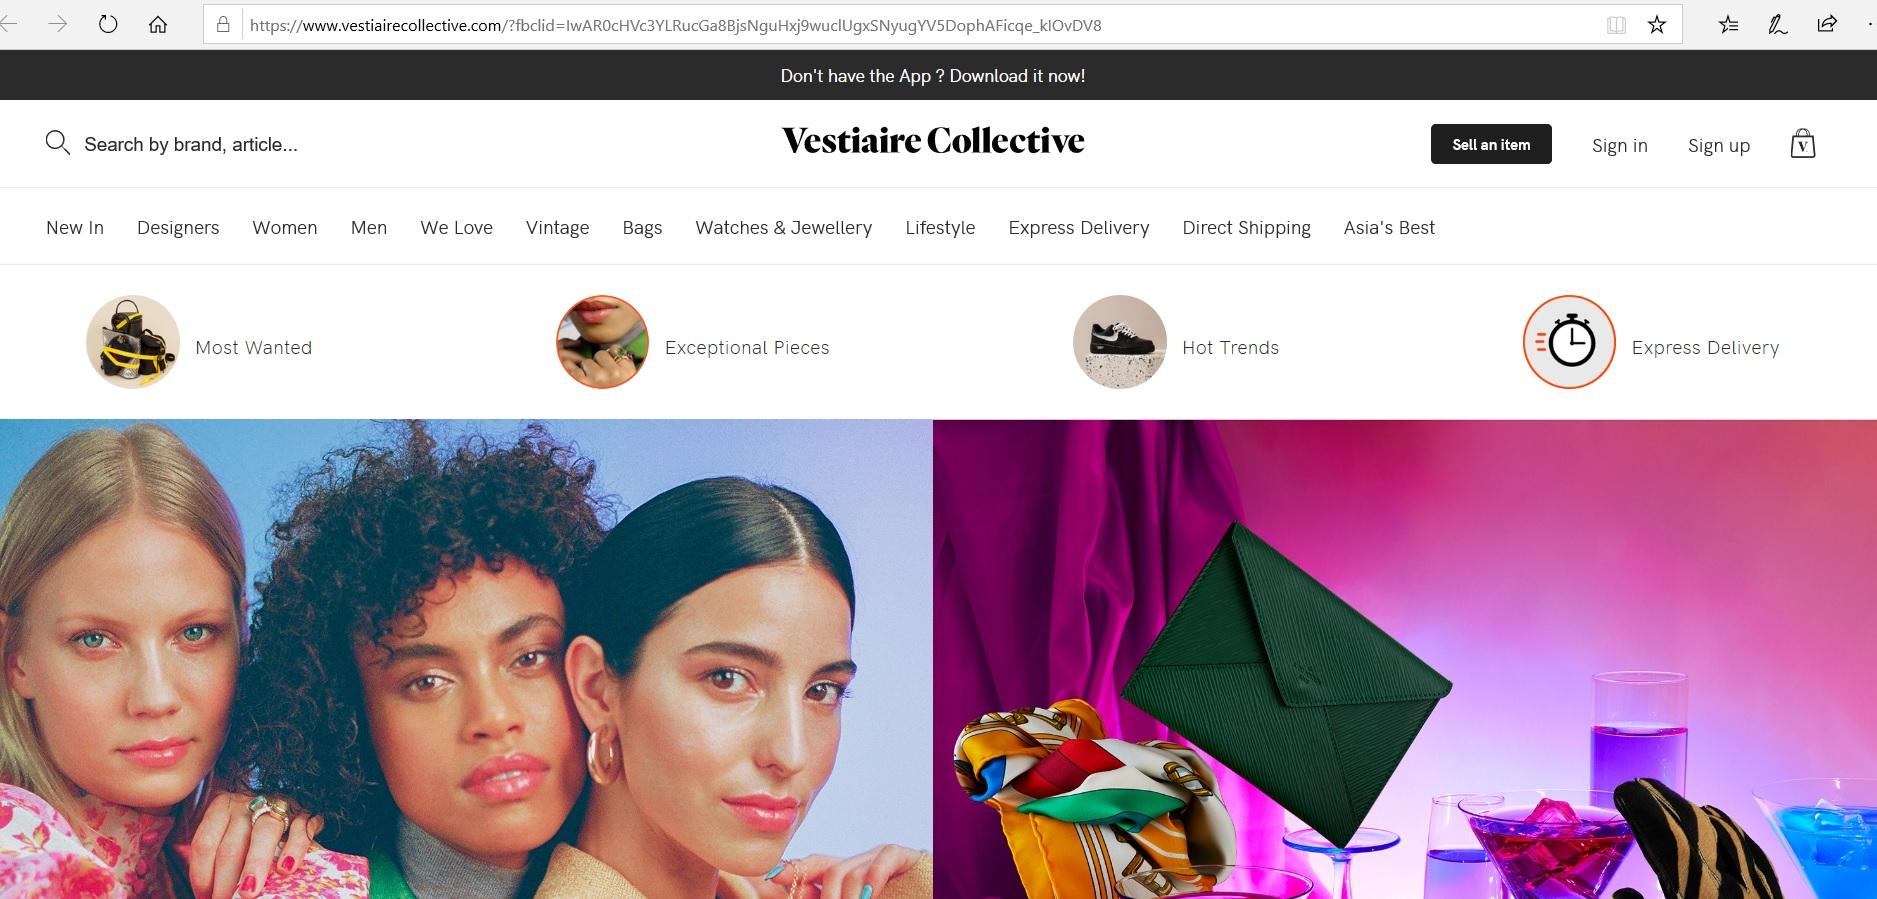 Vestiaire Collective website homepage.